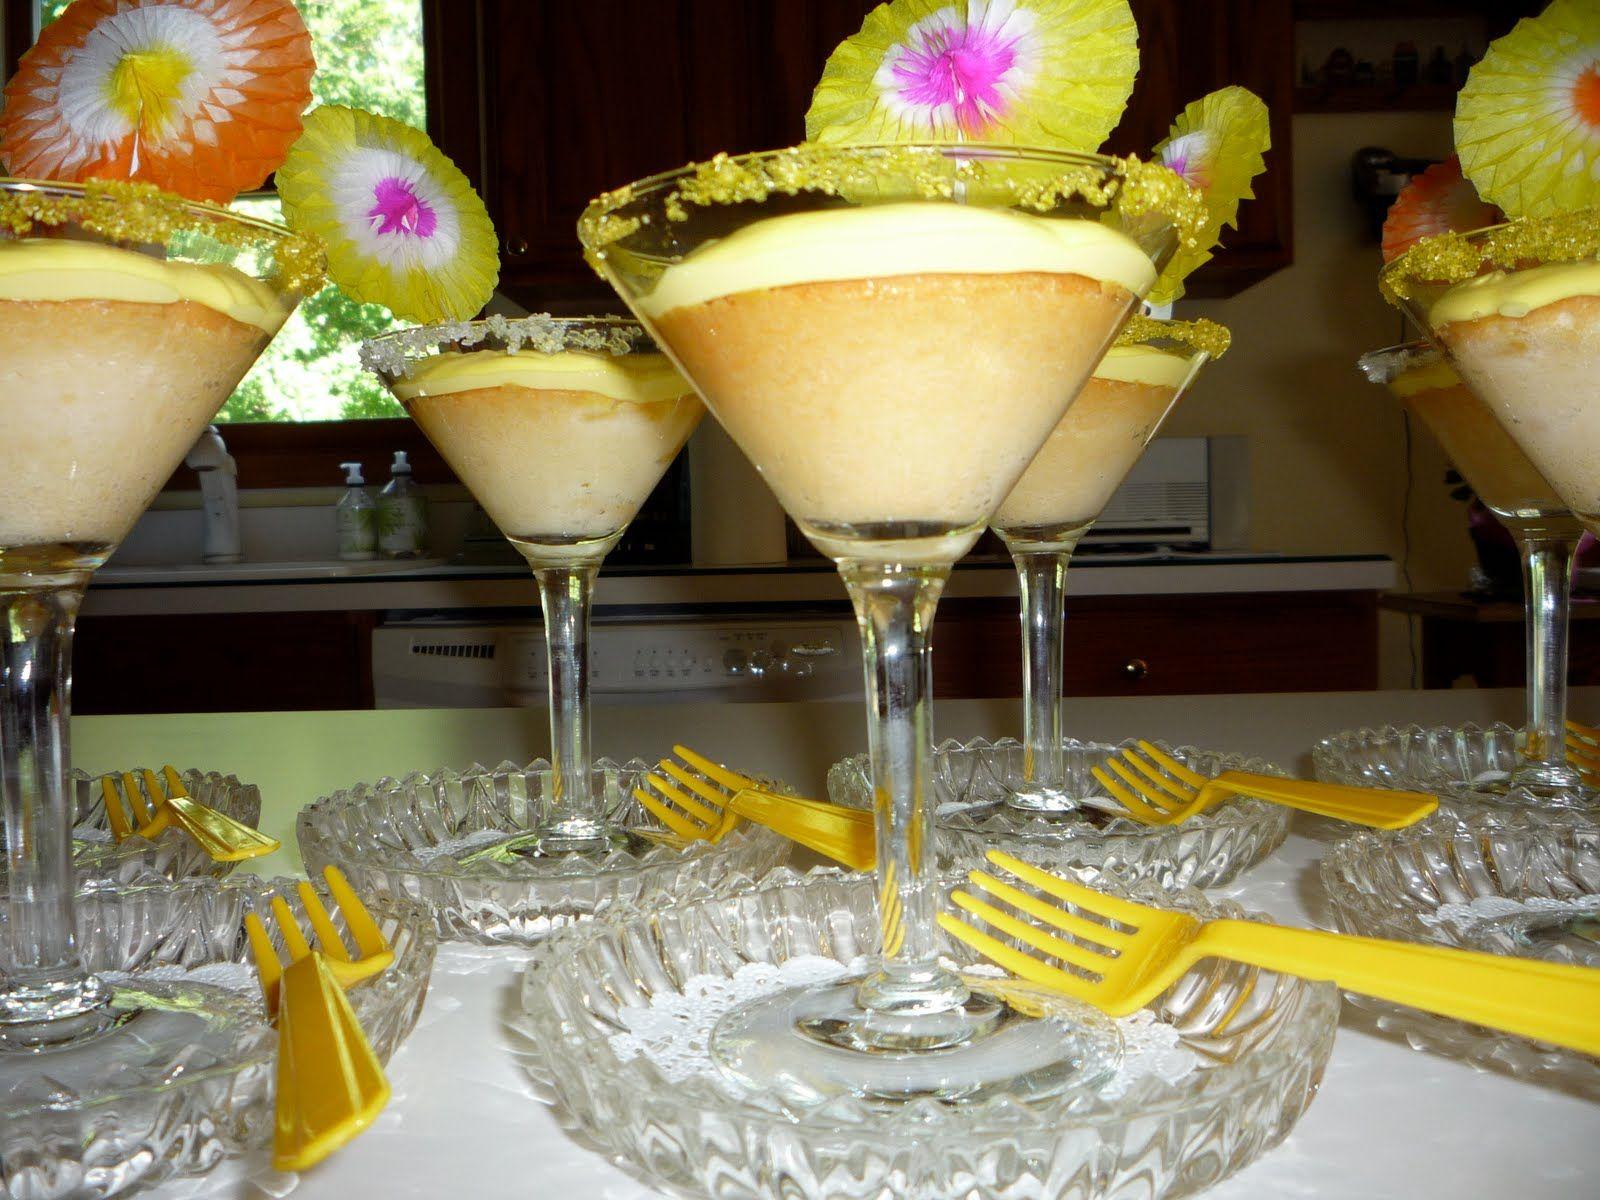 cupcakes in martini glasses | The Quail's Nest: Peach Martini Cupcakes